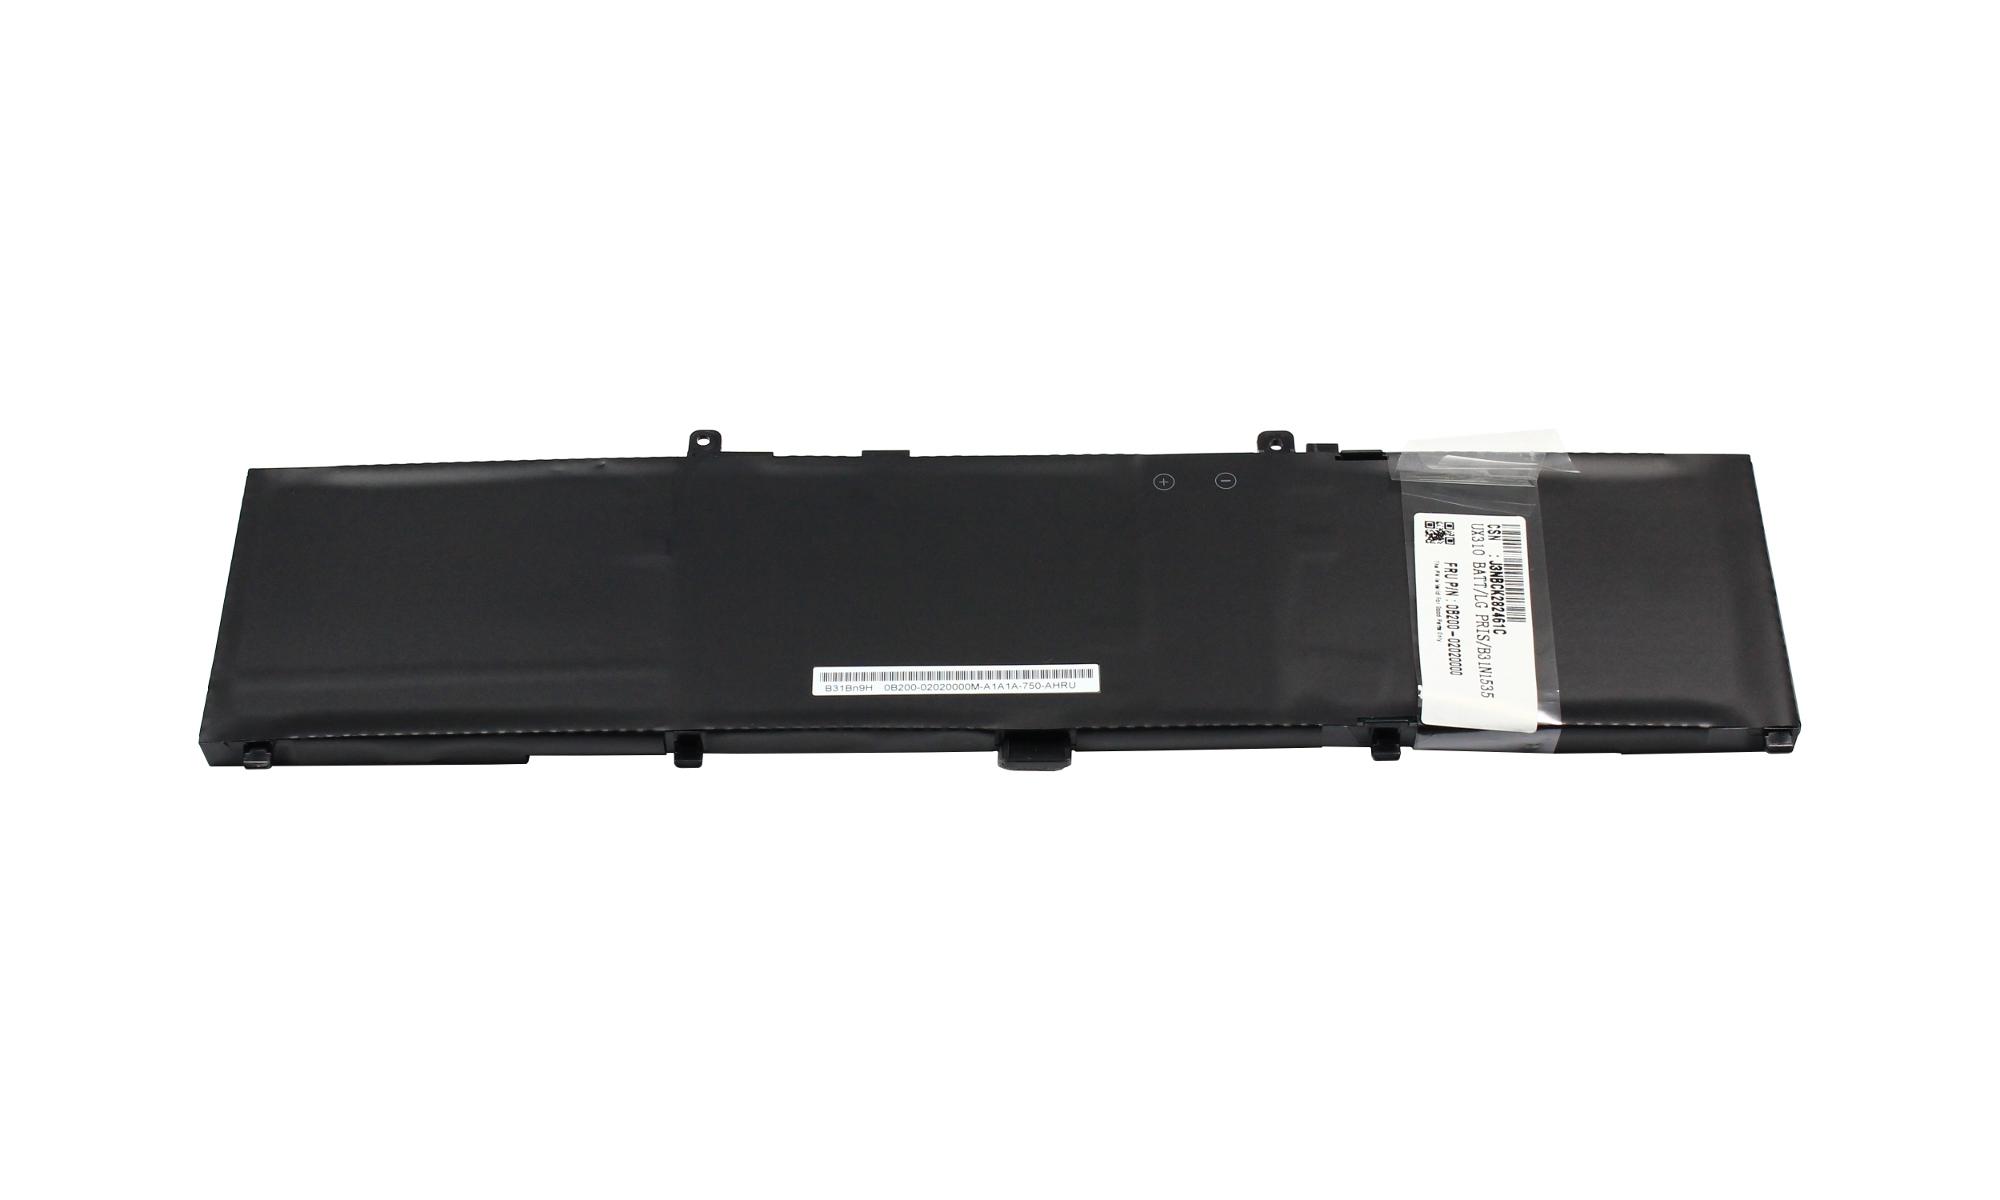 Baterie originala Asus 0B200-02020000, 3 celule 48Wh